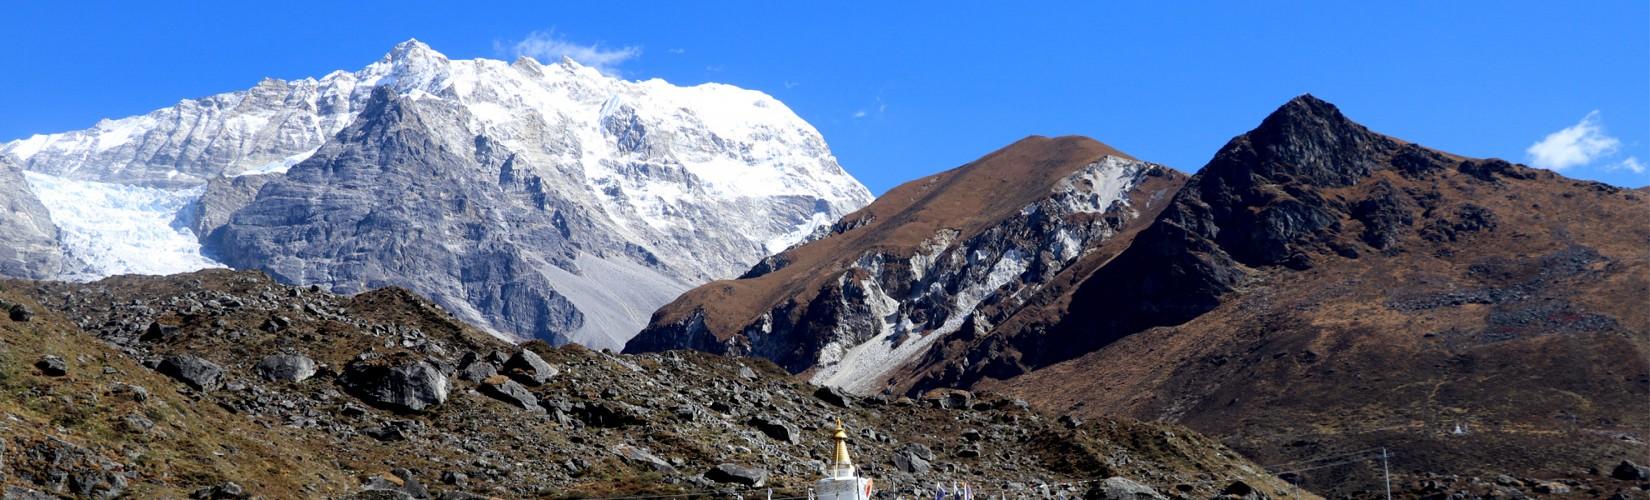 Langtang Valley View from Kyanjin Gumpa